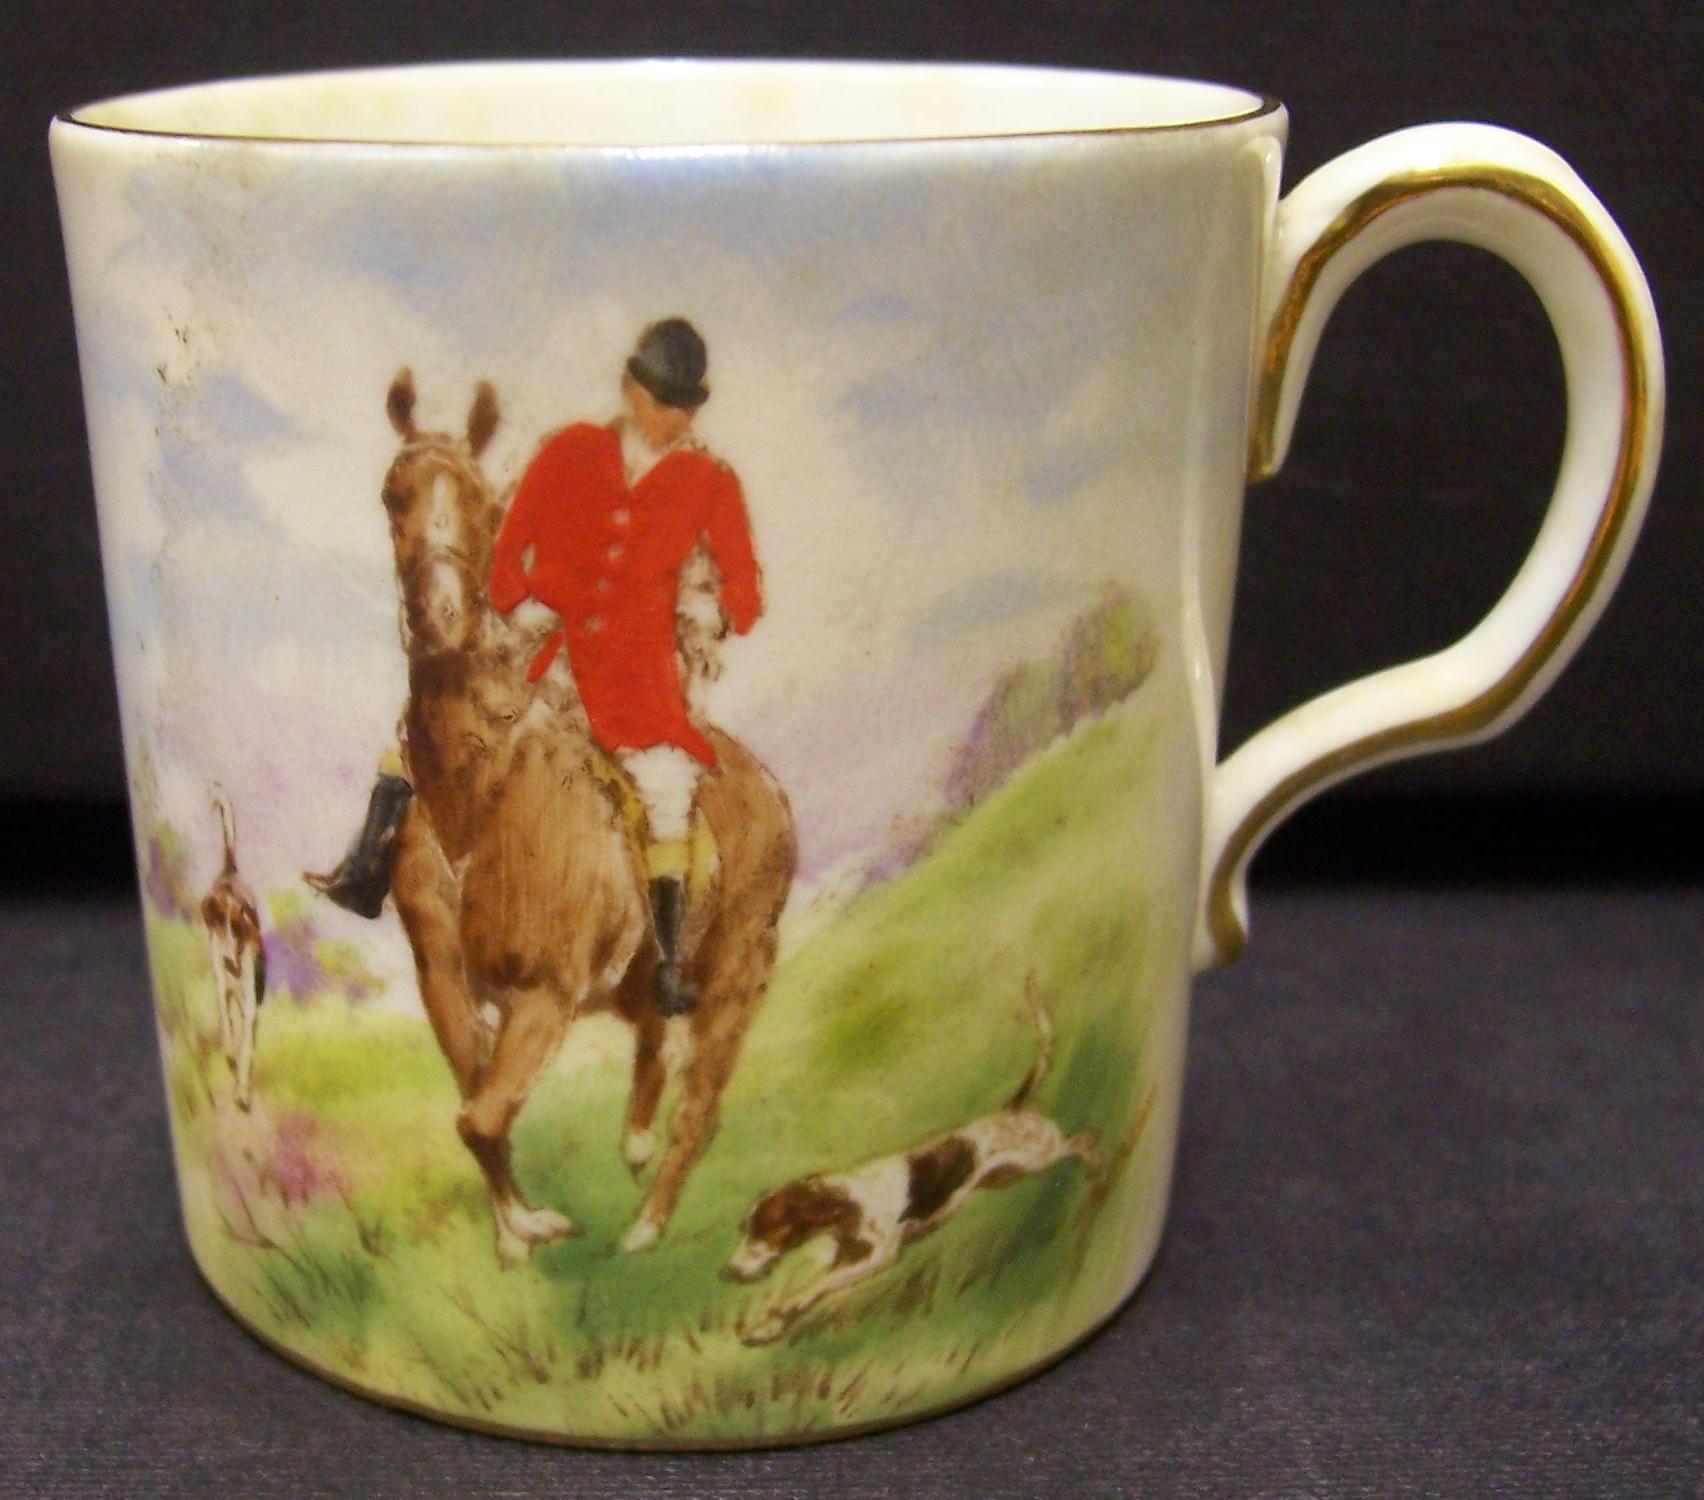 royal-crown-derby-edinburgh-shape-cup-hunting-scene